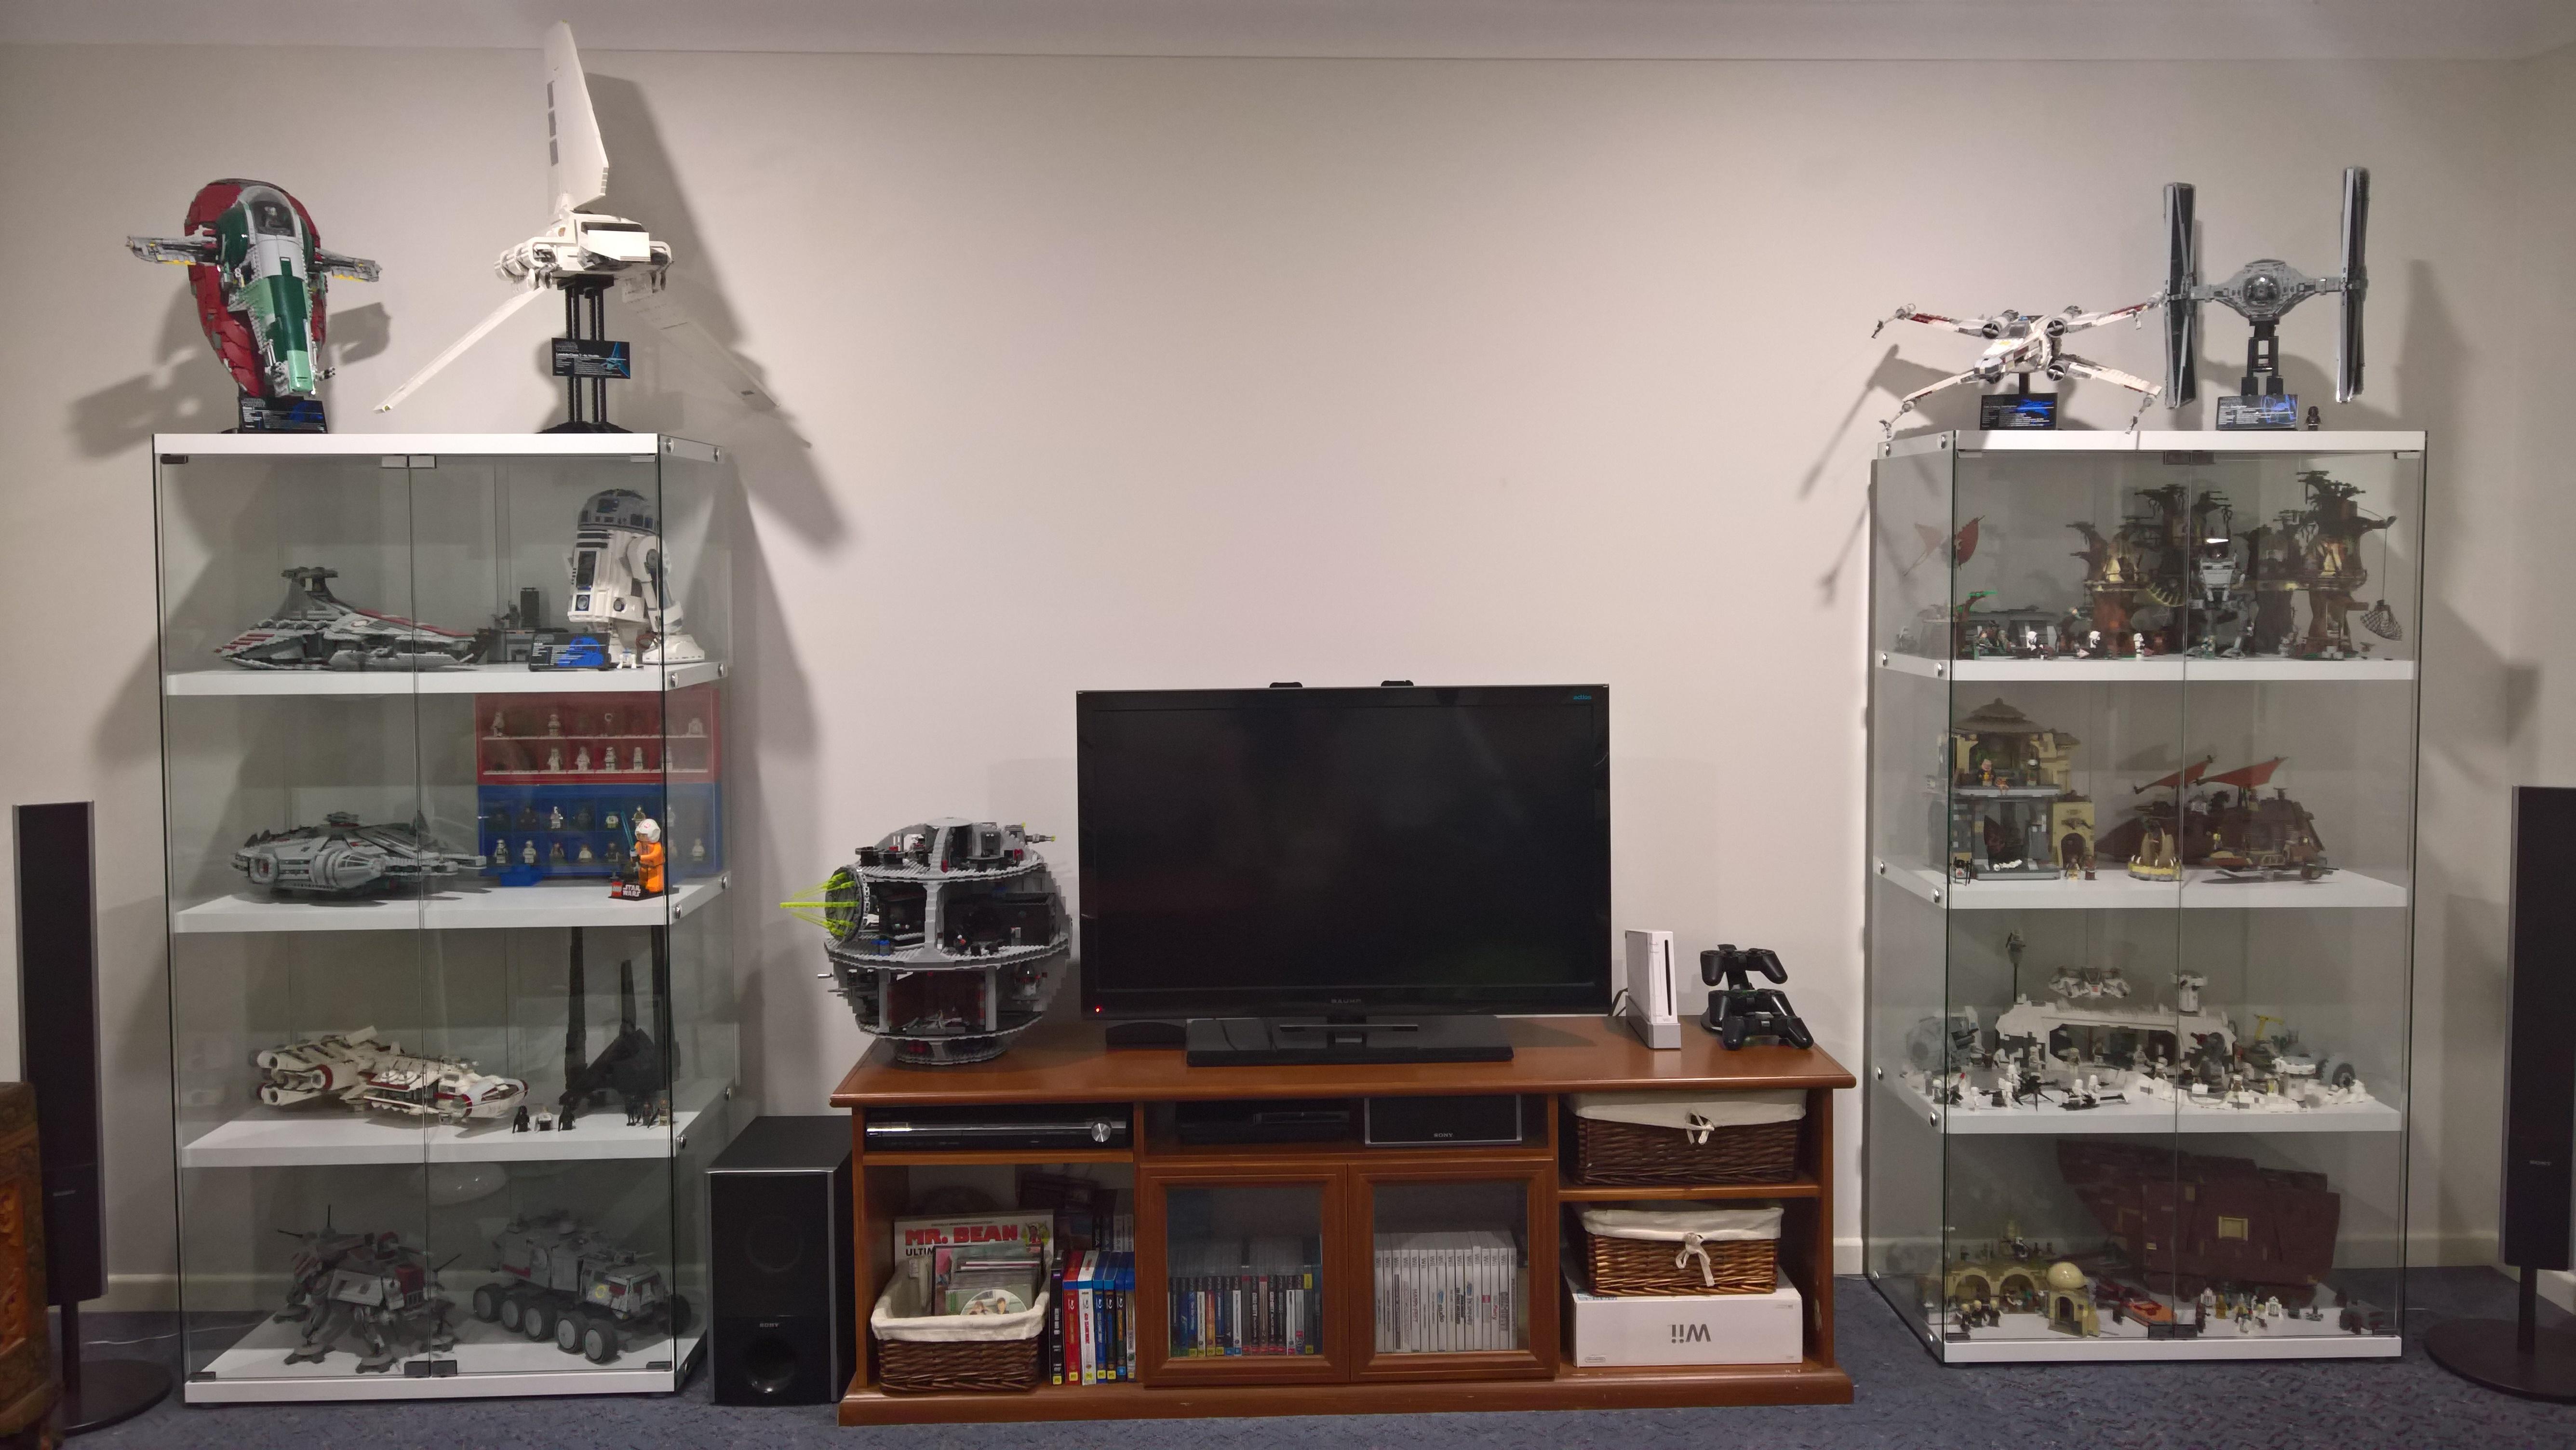 Lego Display Living Room